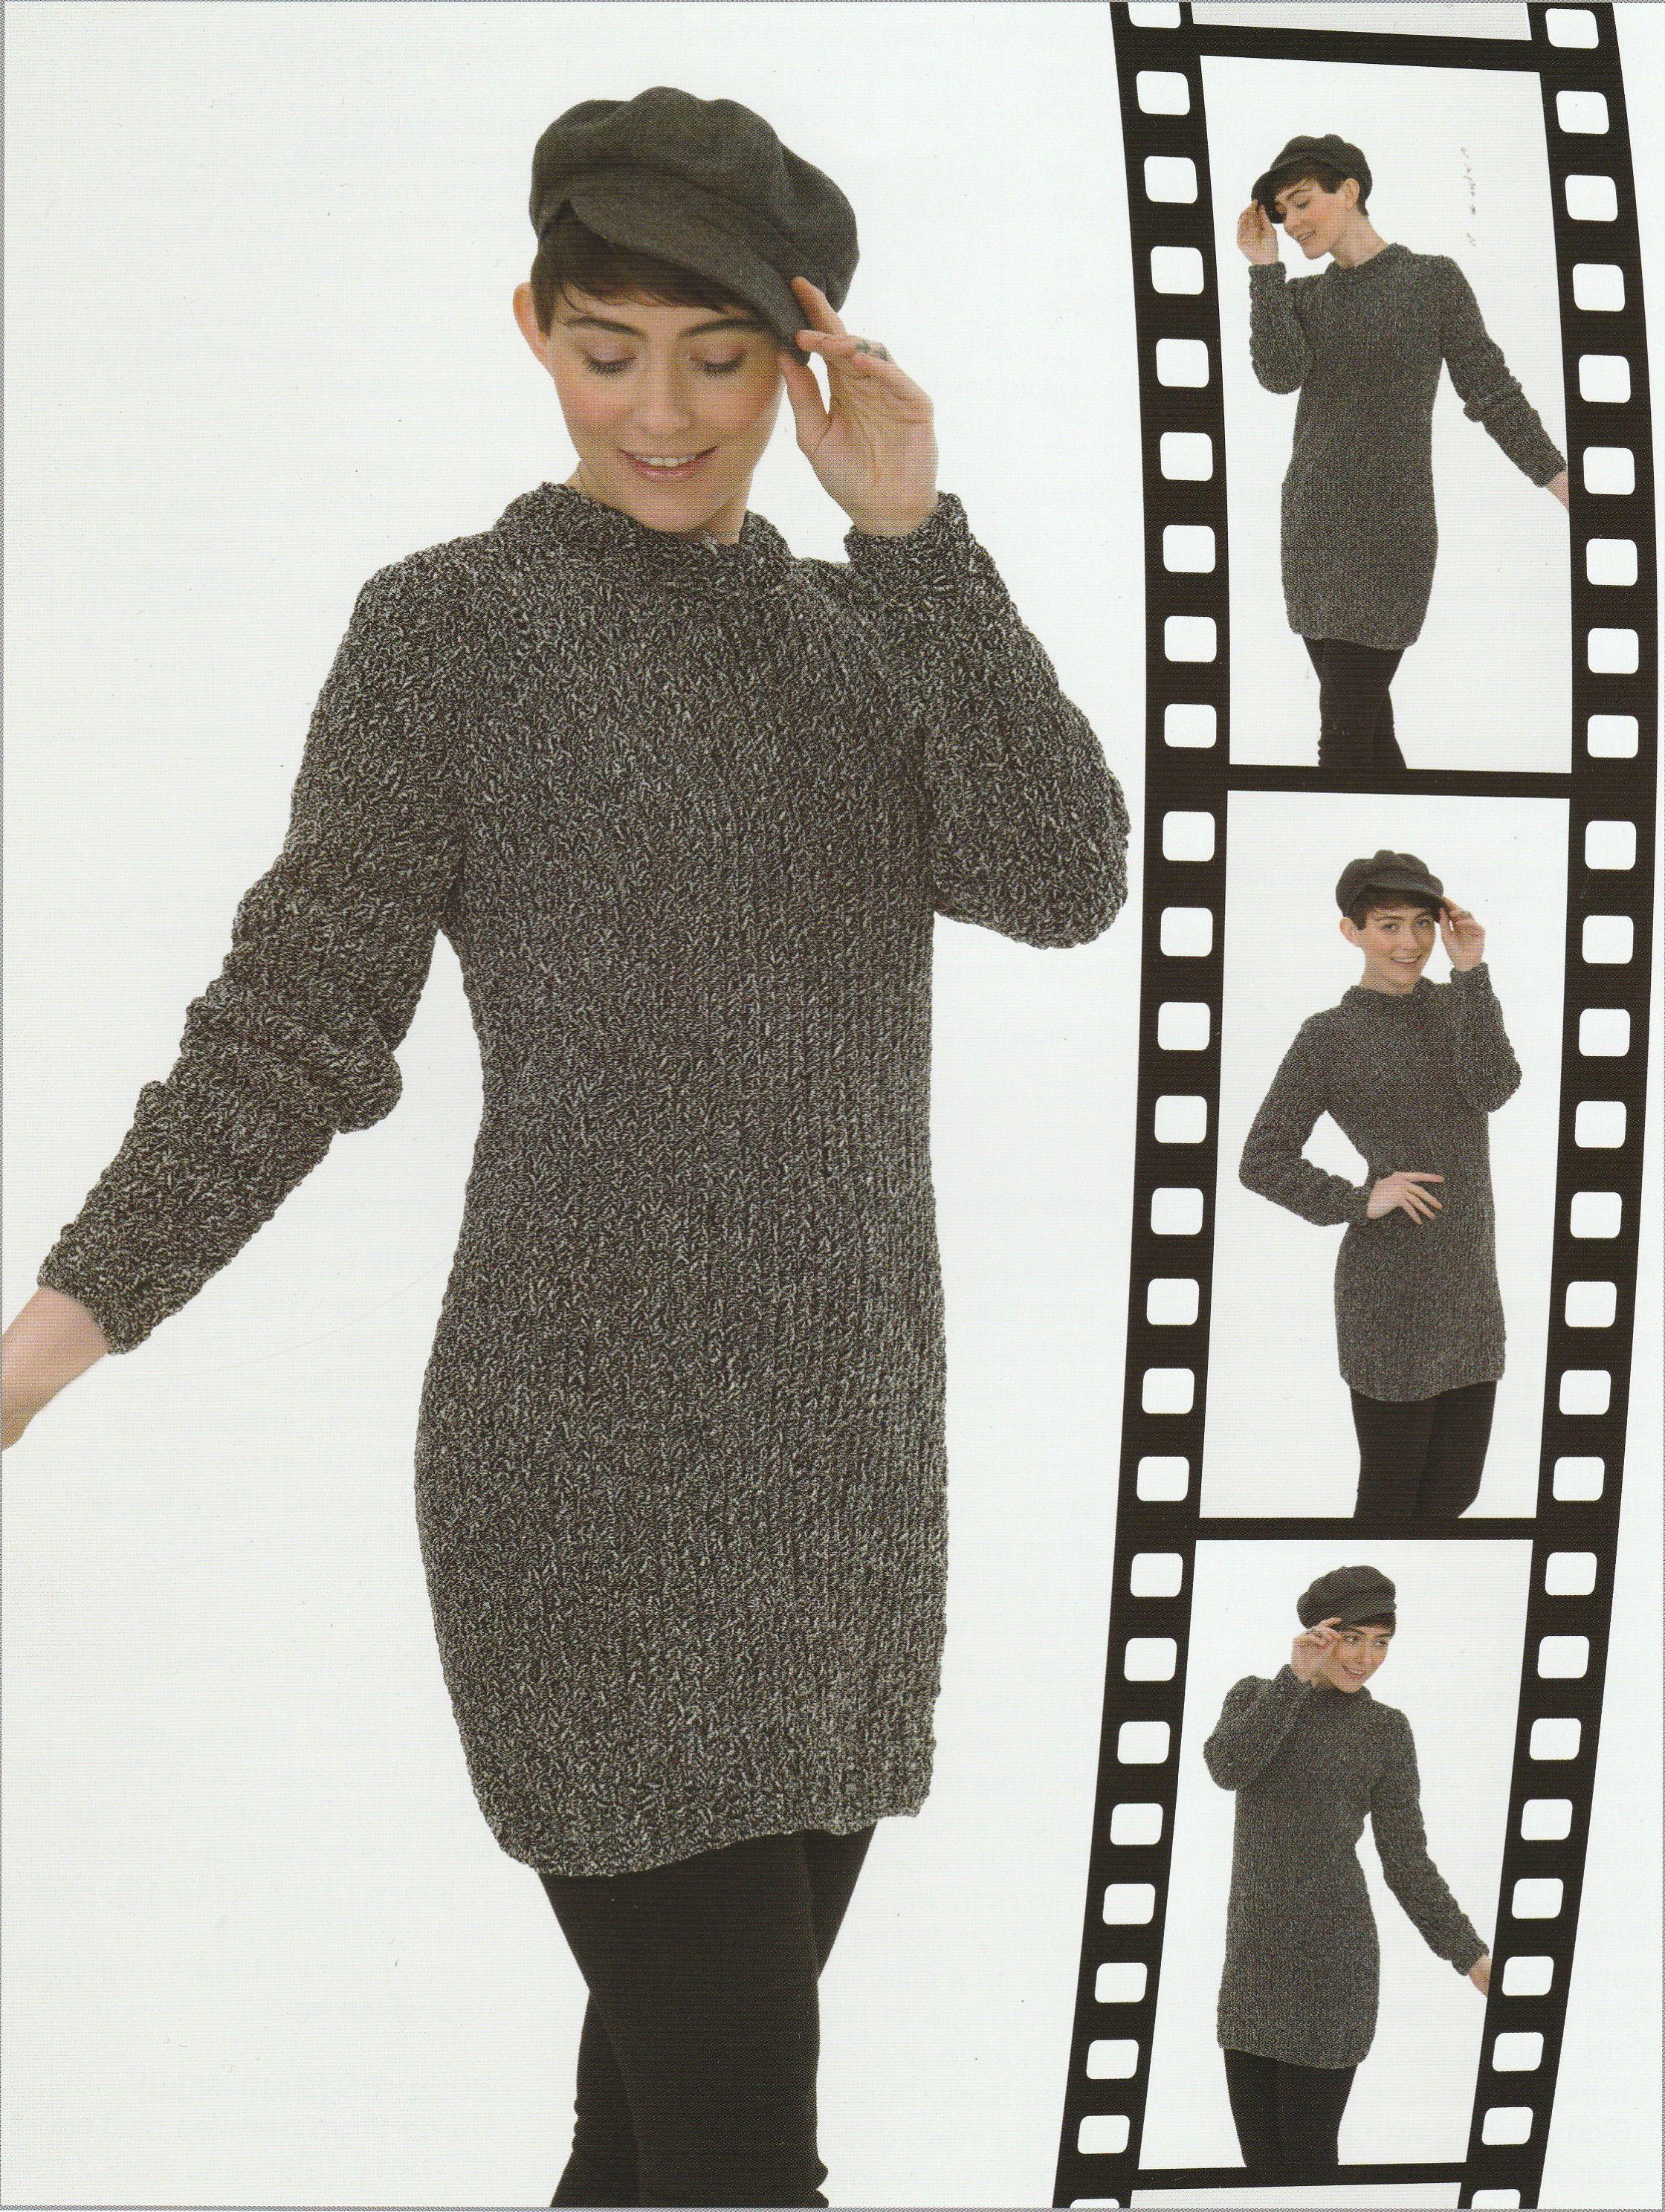 Super Chunky Sweater Dress Knitting Pattern By Threadbaregifts On Etsy Easy Sweater Knitting Patterns Sweater Dress Pattern Etsy Sweater [ 2976 x 2240 Pixel ]